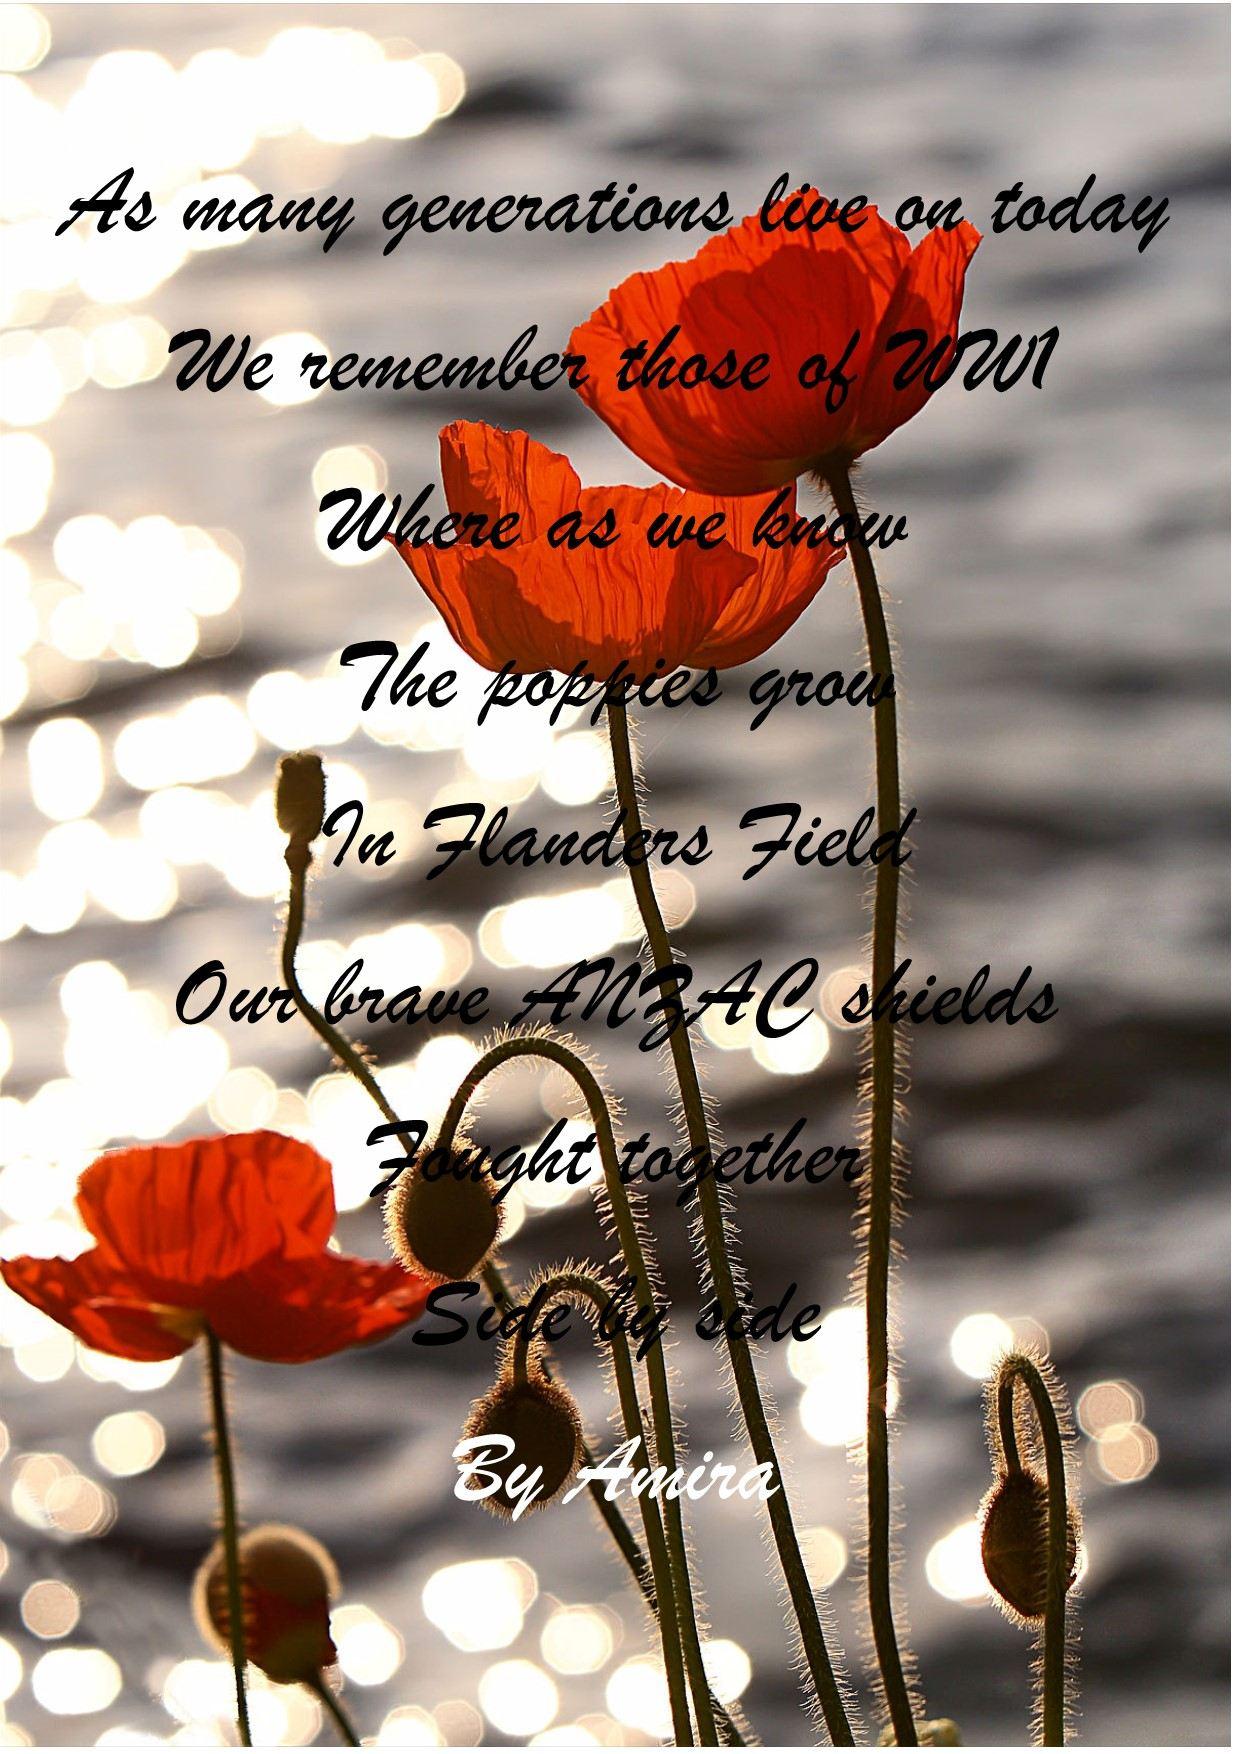 Poppy Poem For Anzac Day By Amira 1yj80y3 Tiger Tales